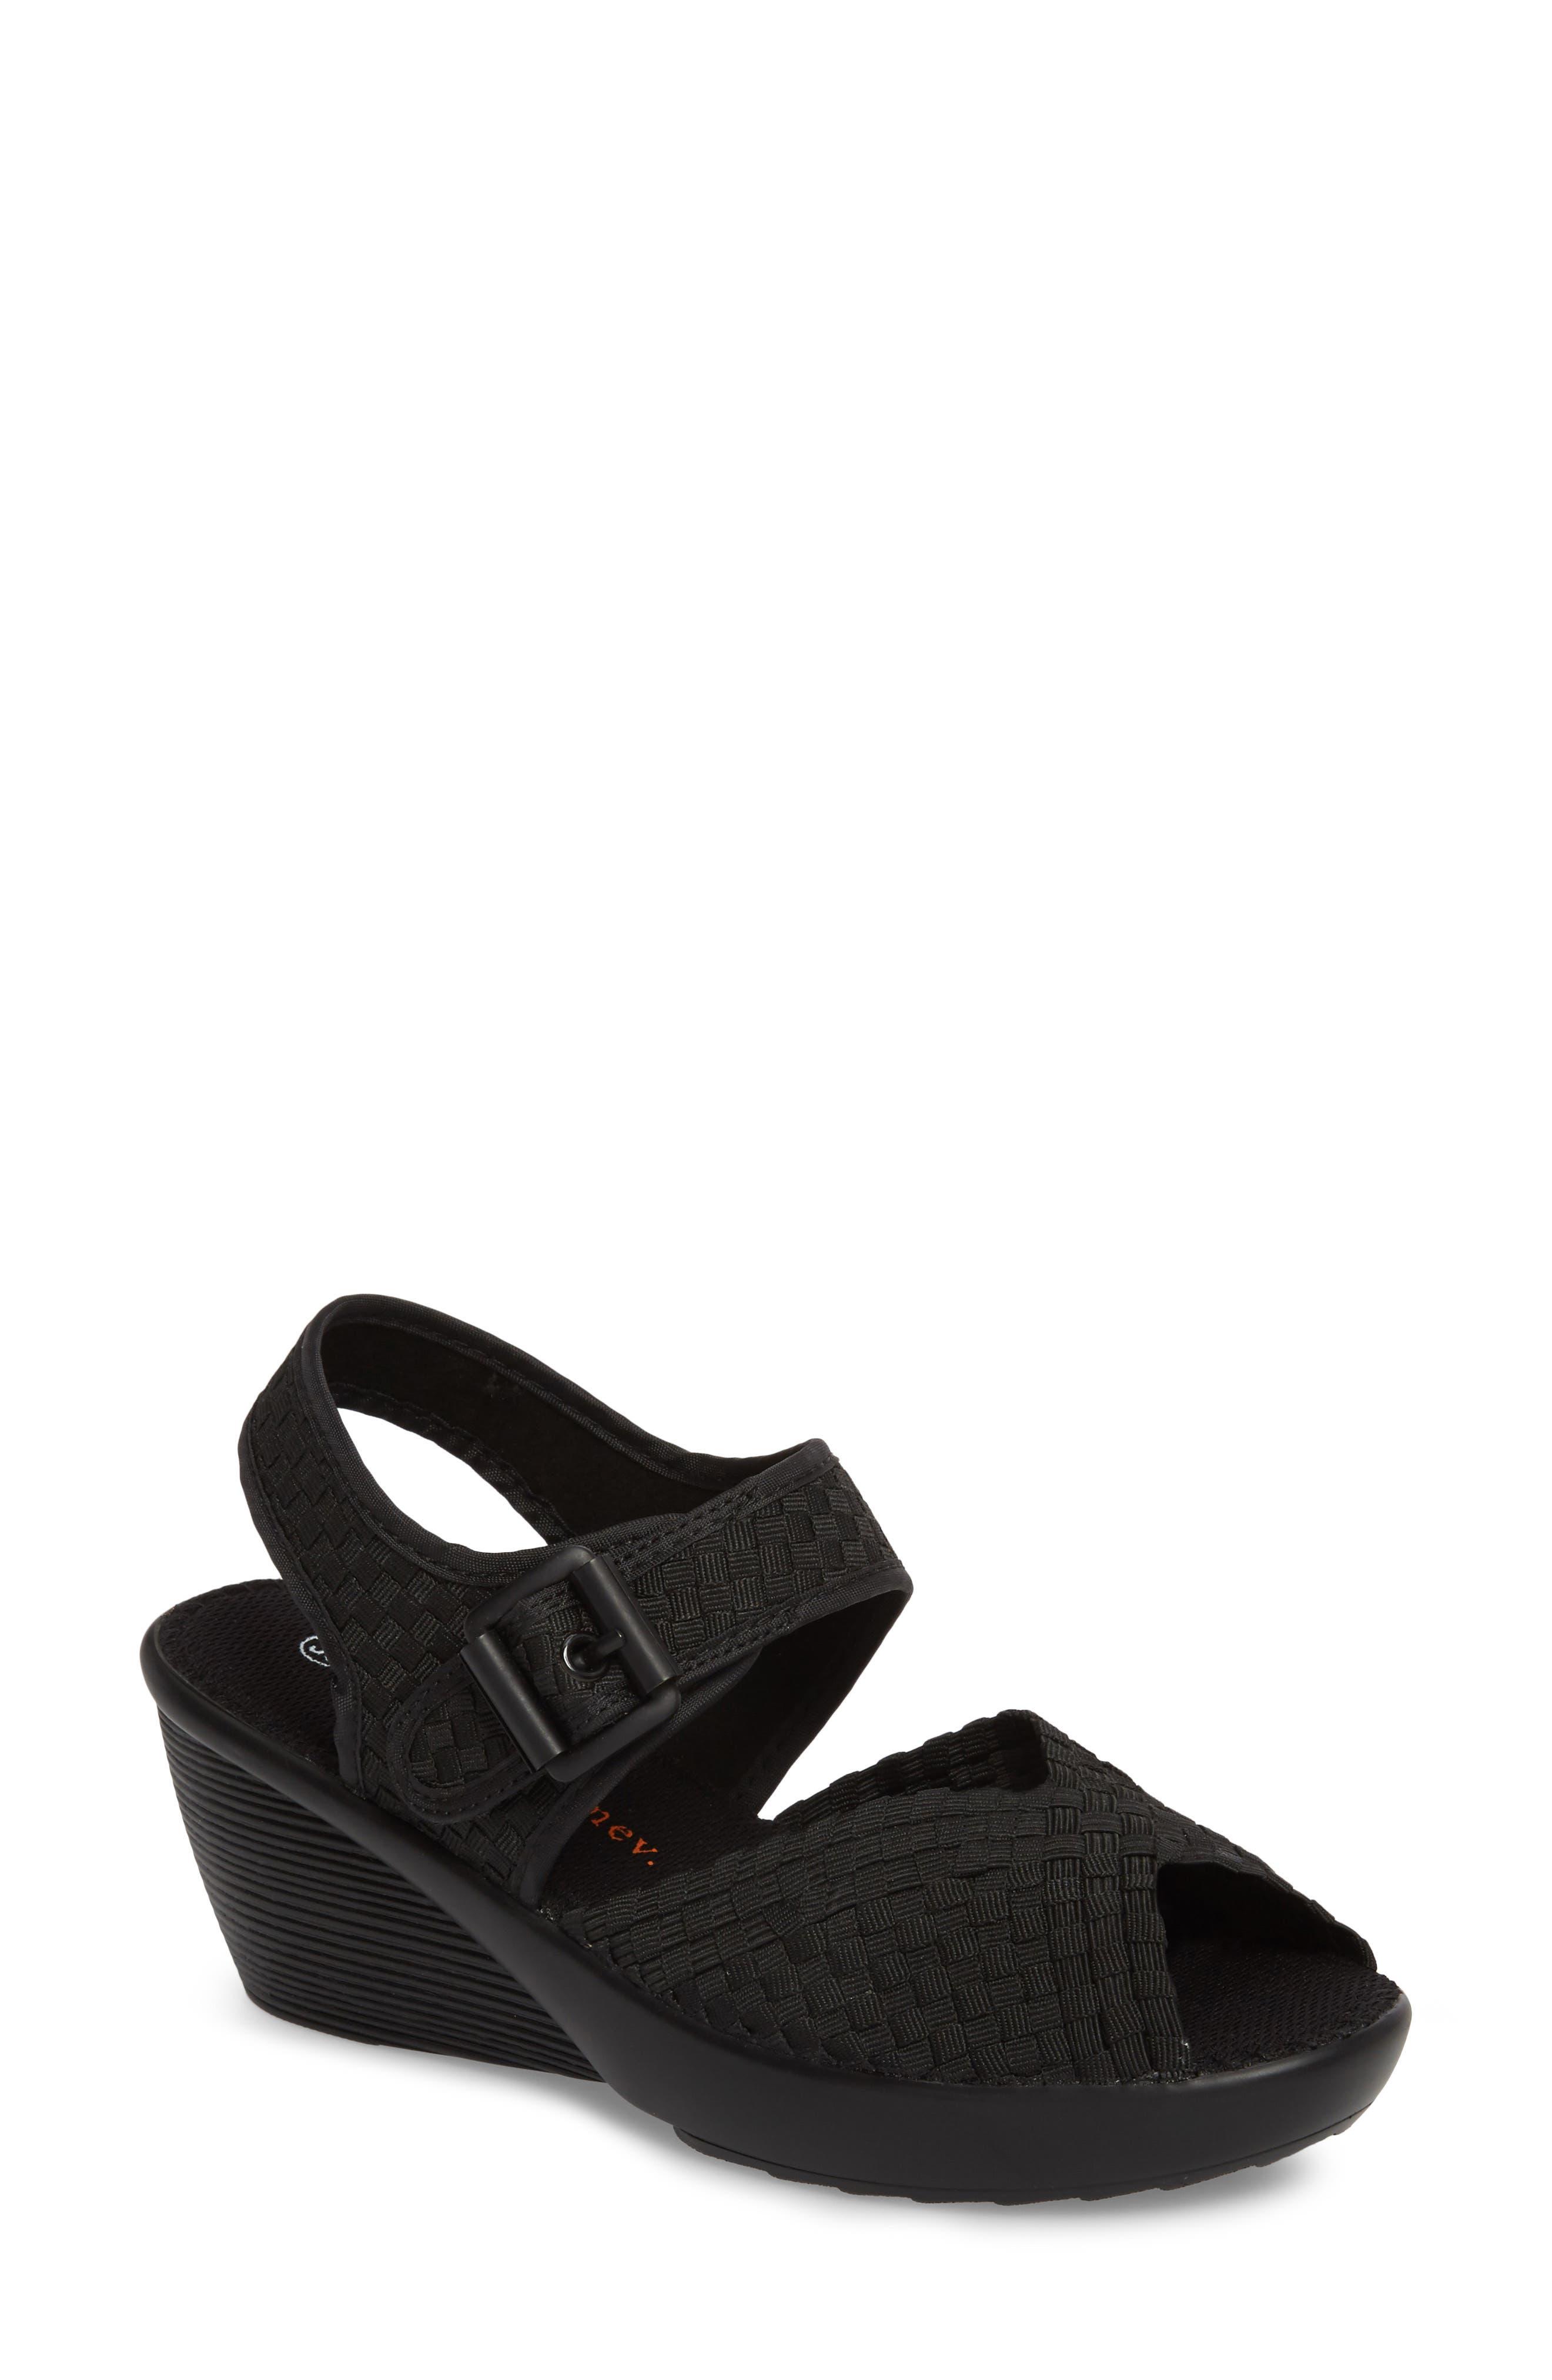 . Wedge Sandal